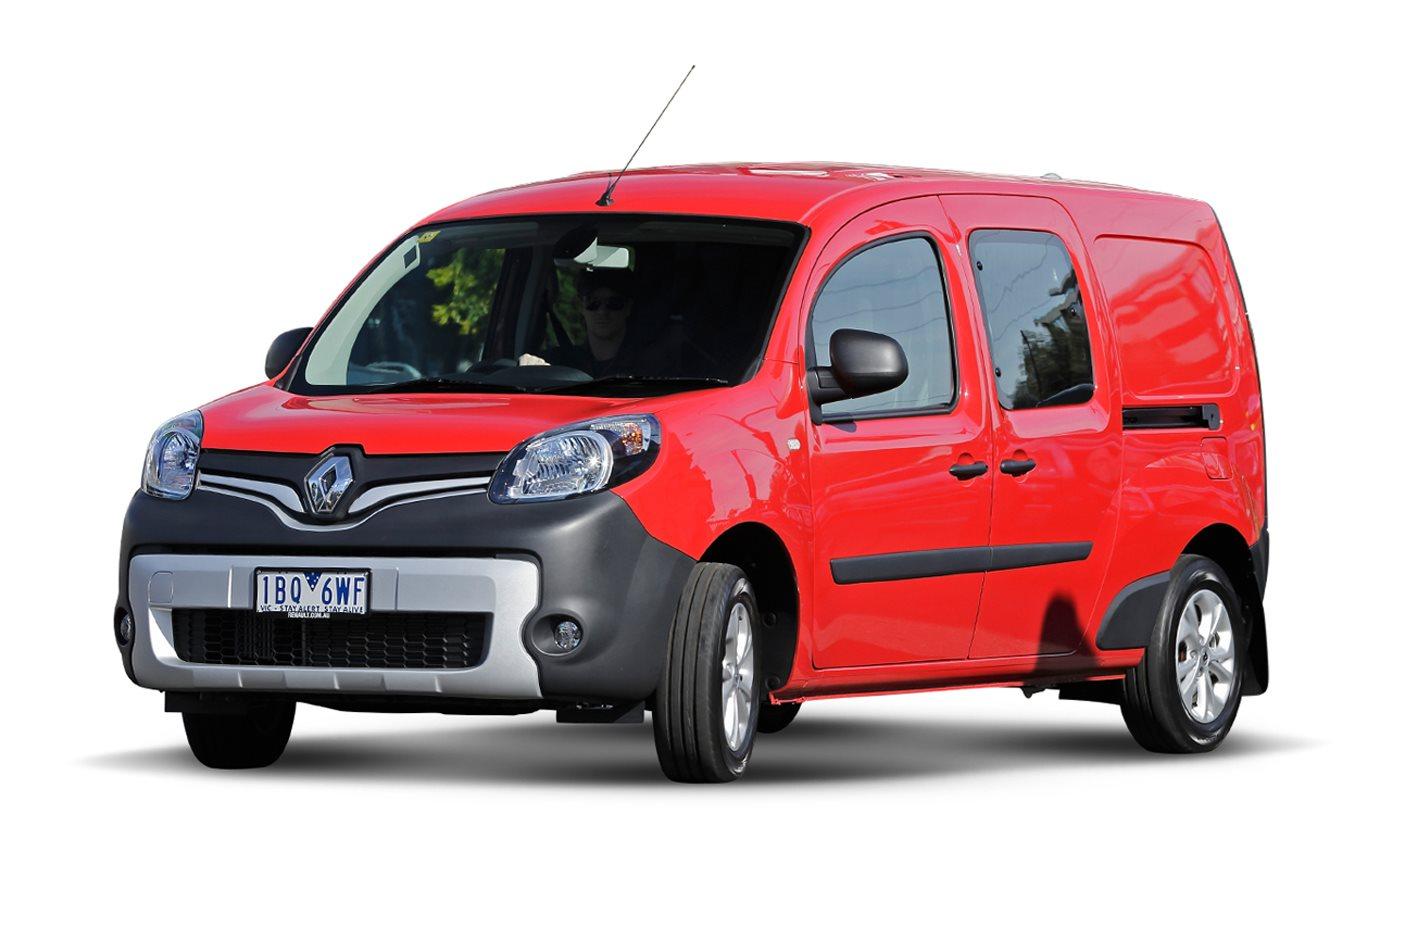 2016 renault kangoo maxi 1 5l 4cyl diesel turbocharged manual van rh whichcar com au Renault Kangoo Van Renault Kangoo Dimensions